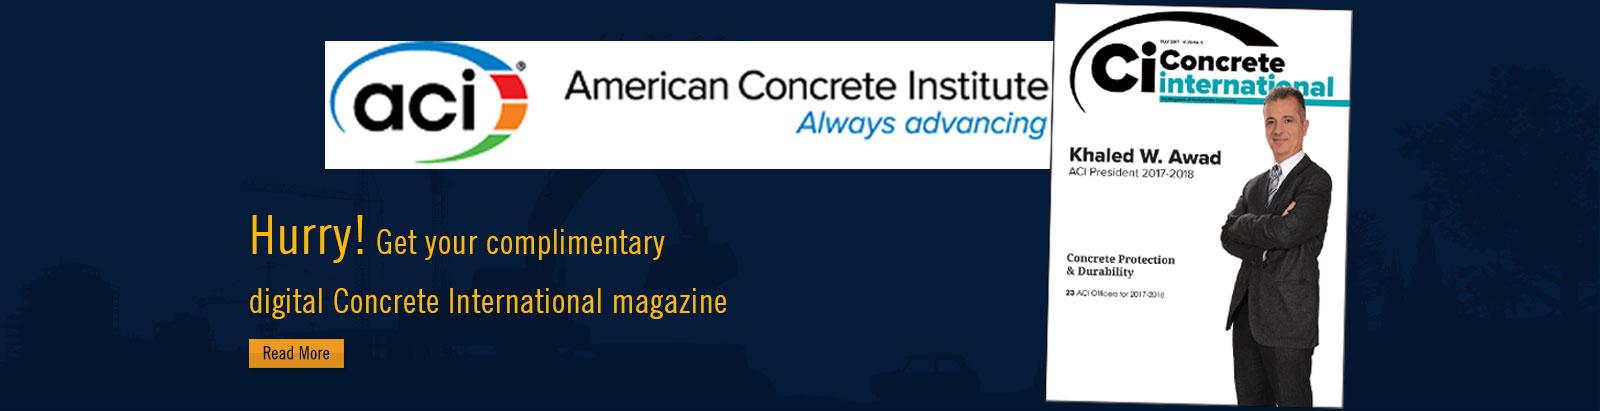 aci-magazine-complimentary